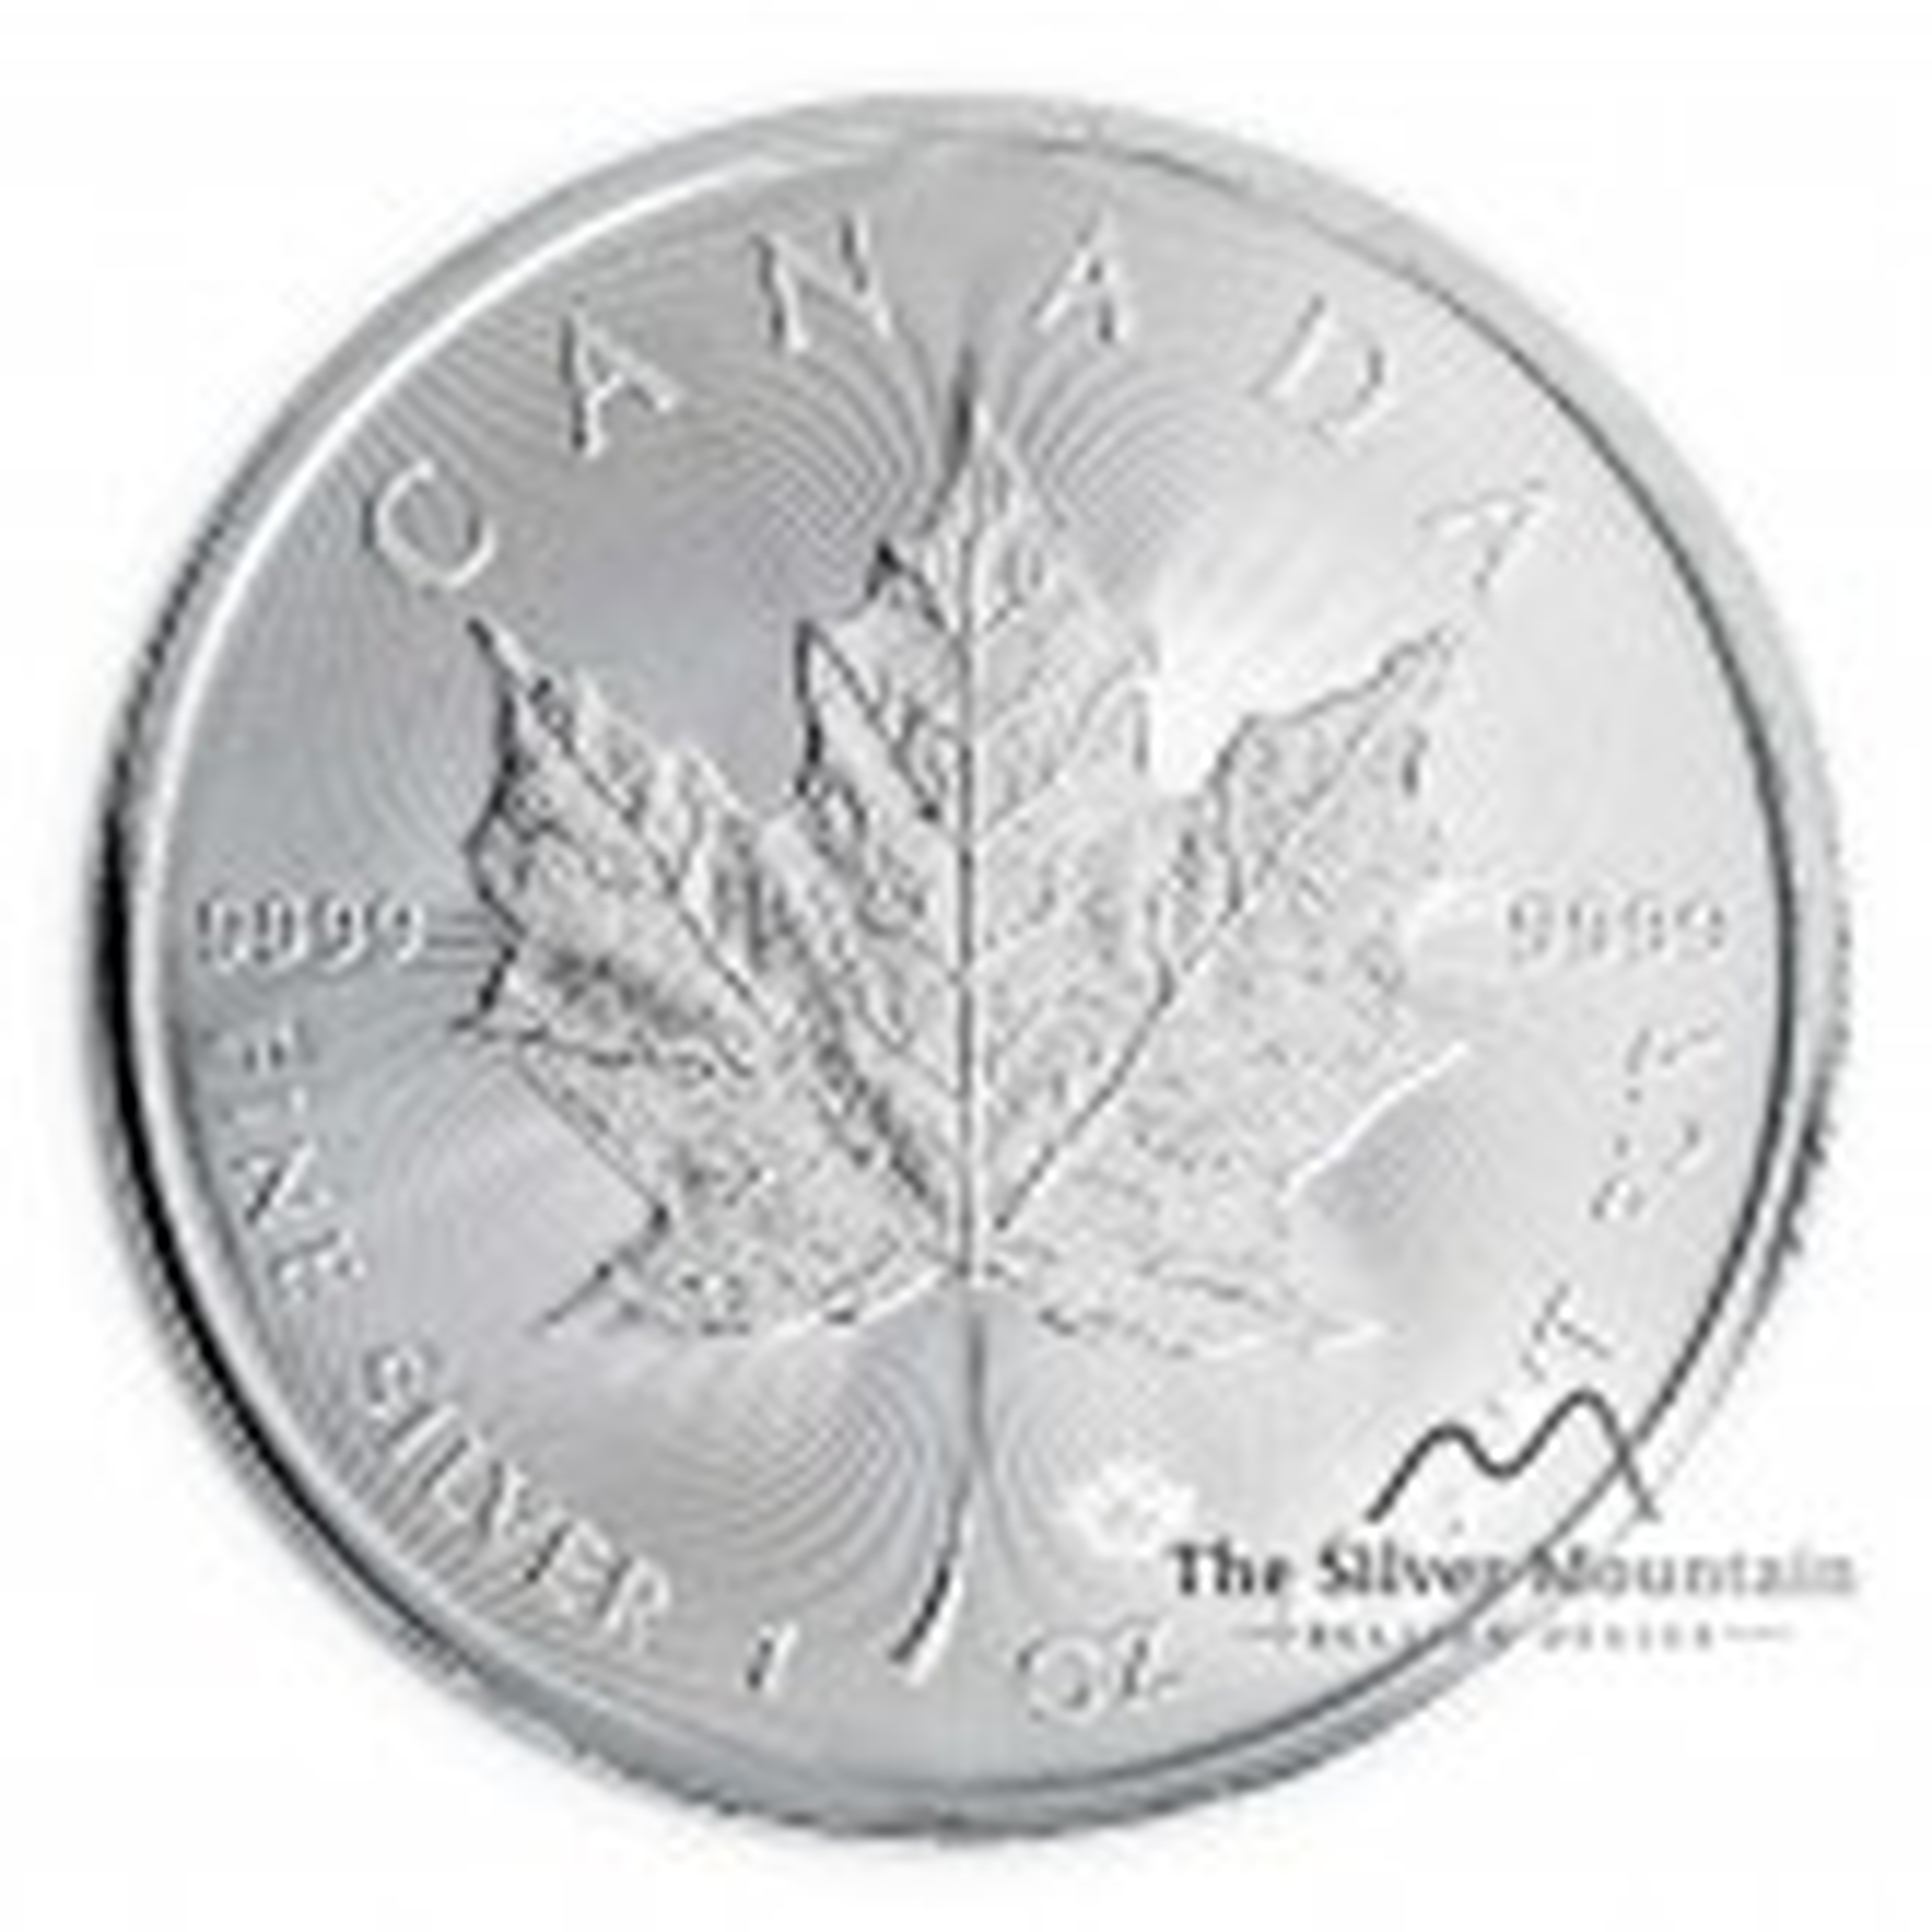 Nieuwe zilveren Maple Leaf munt 2021